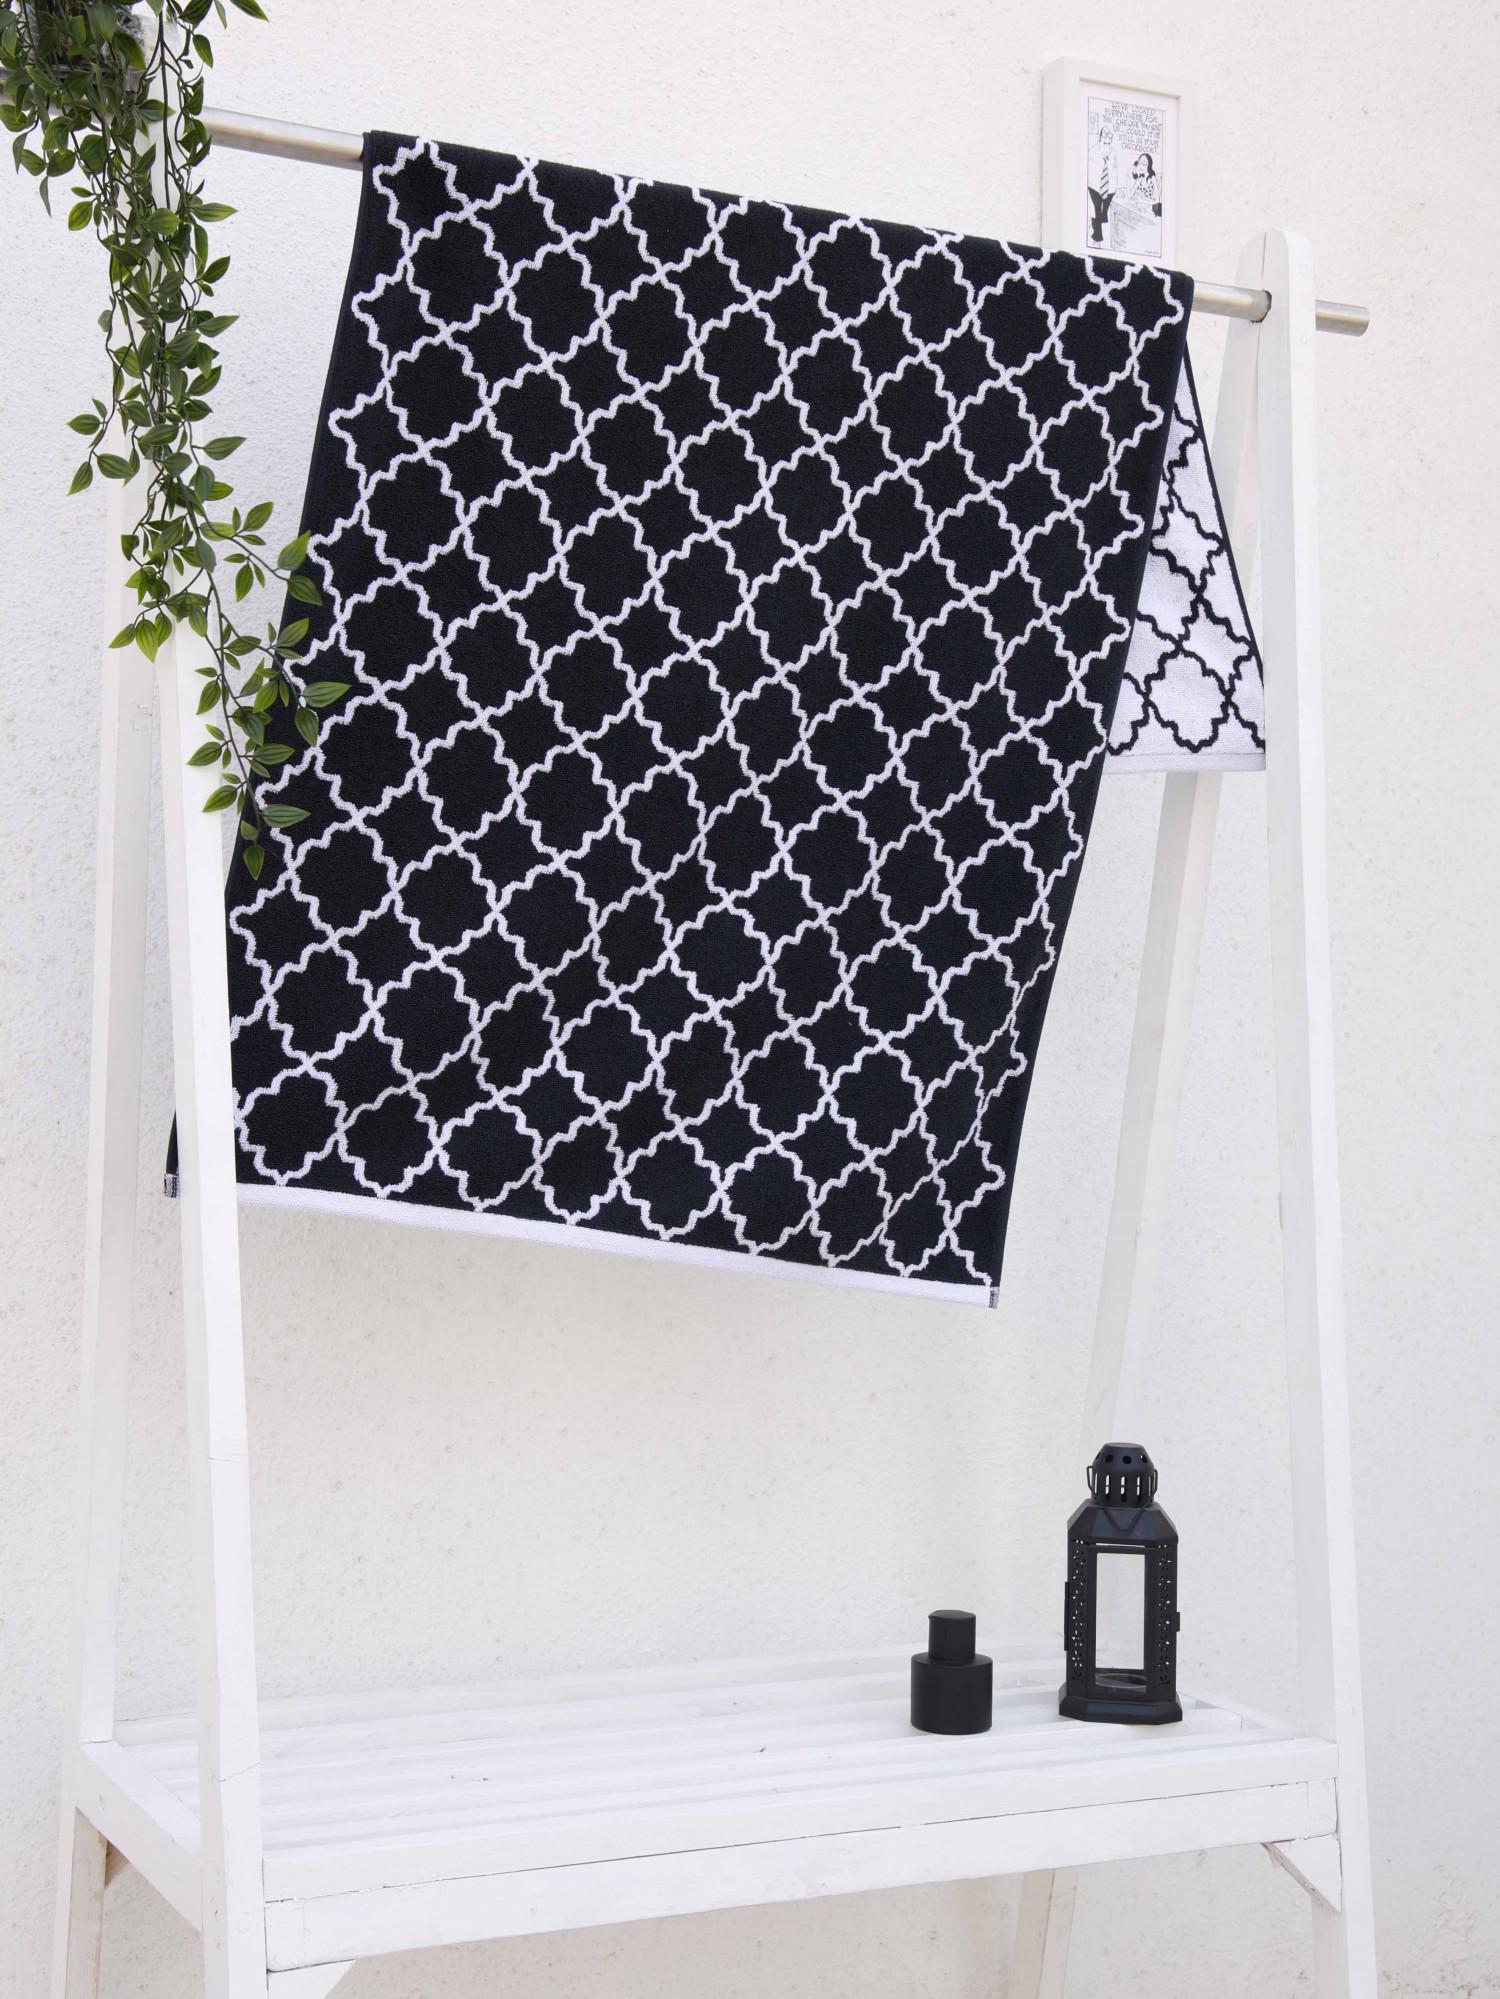 Grandoise Imperial D1 Towel